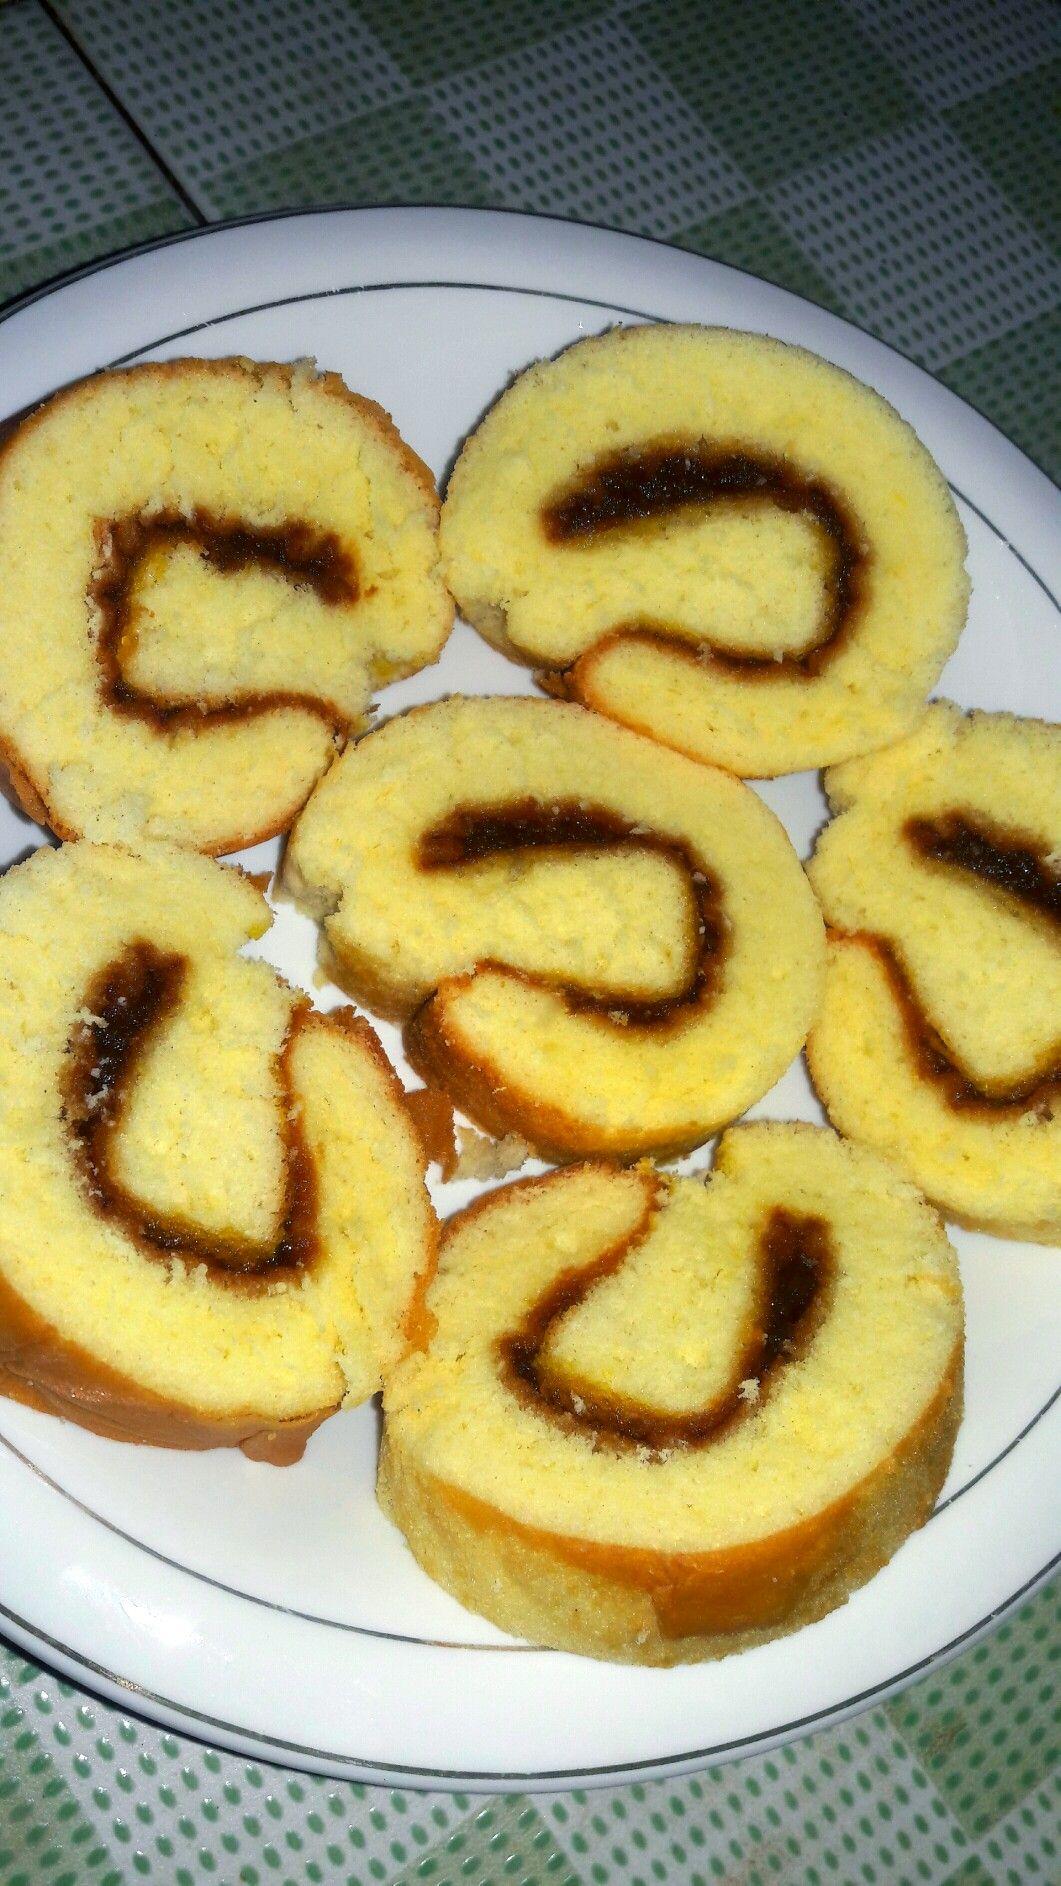 Resep Bolu pisang panggang oleh debby | Resep | Makanan